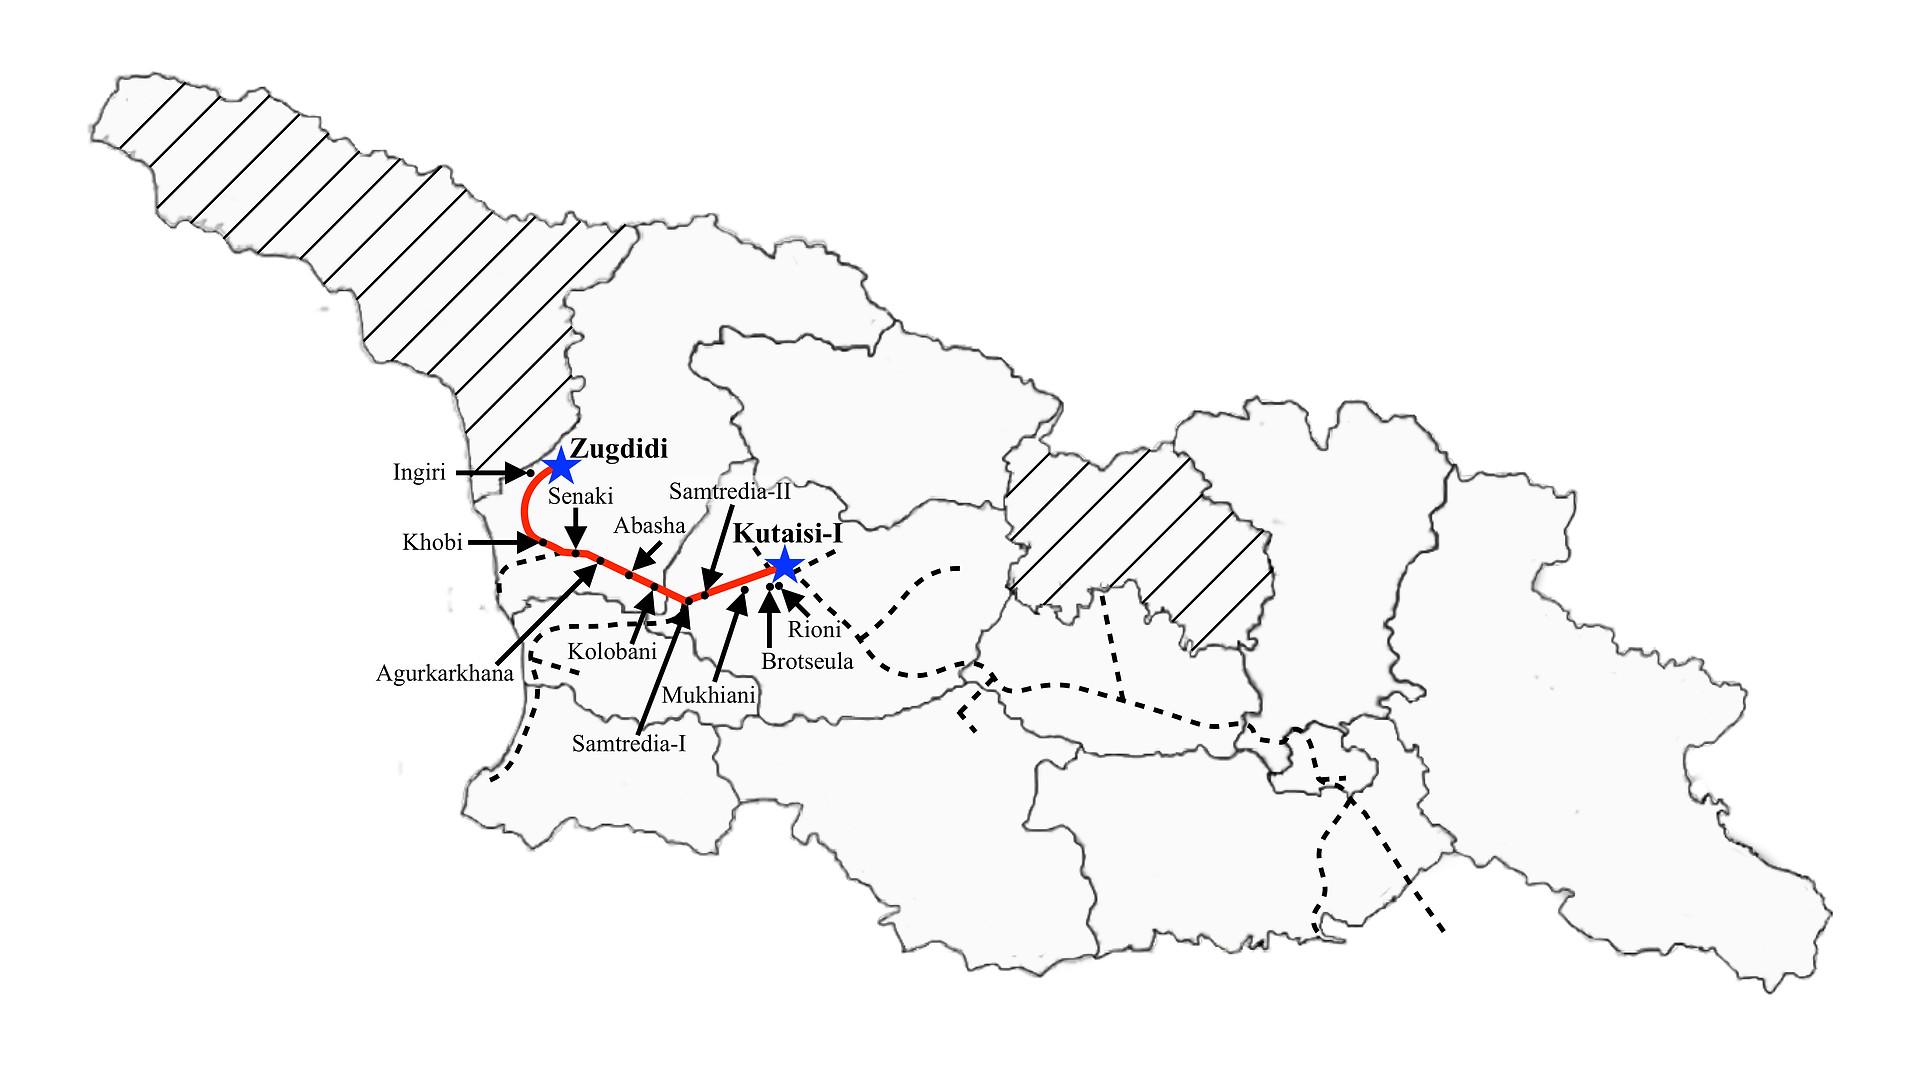 Zugdidi to Kutaisi I